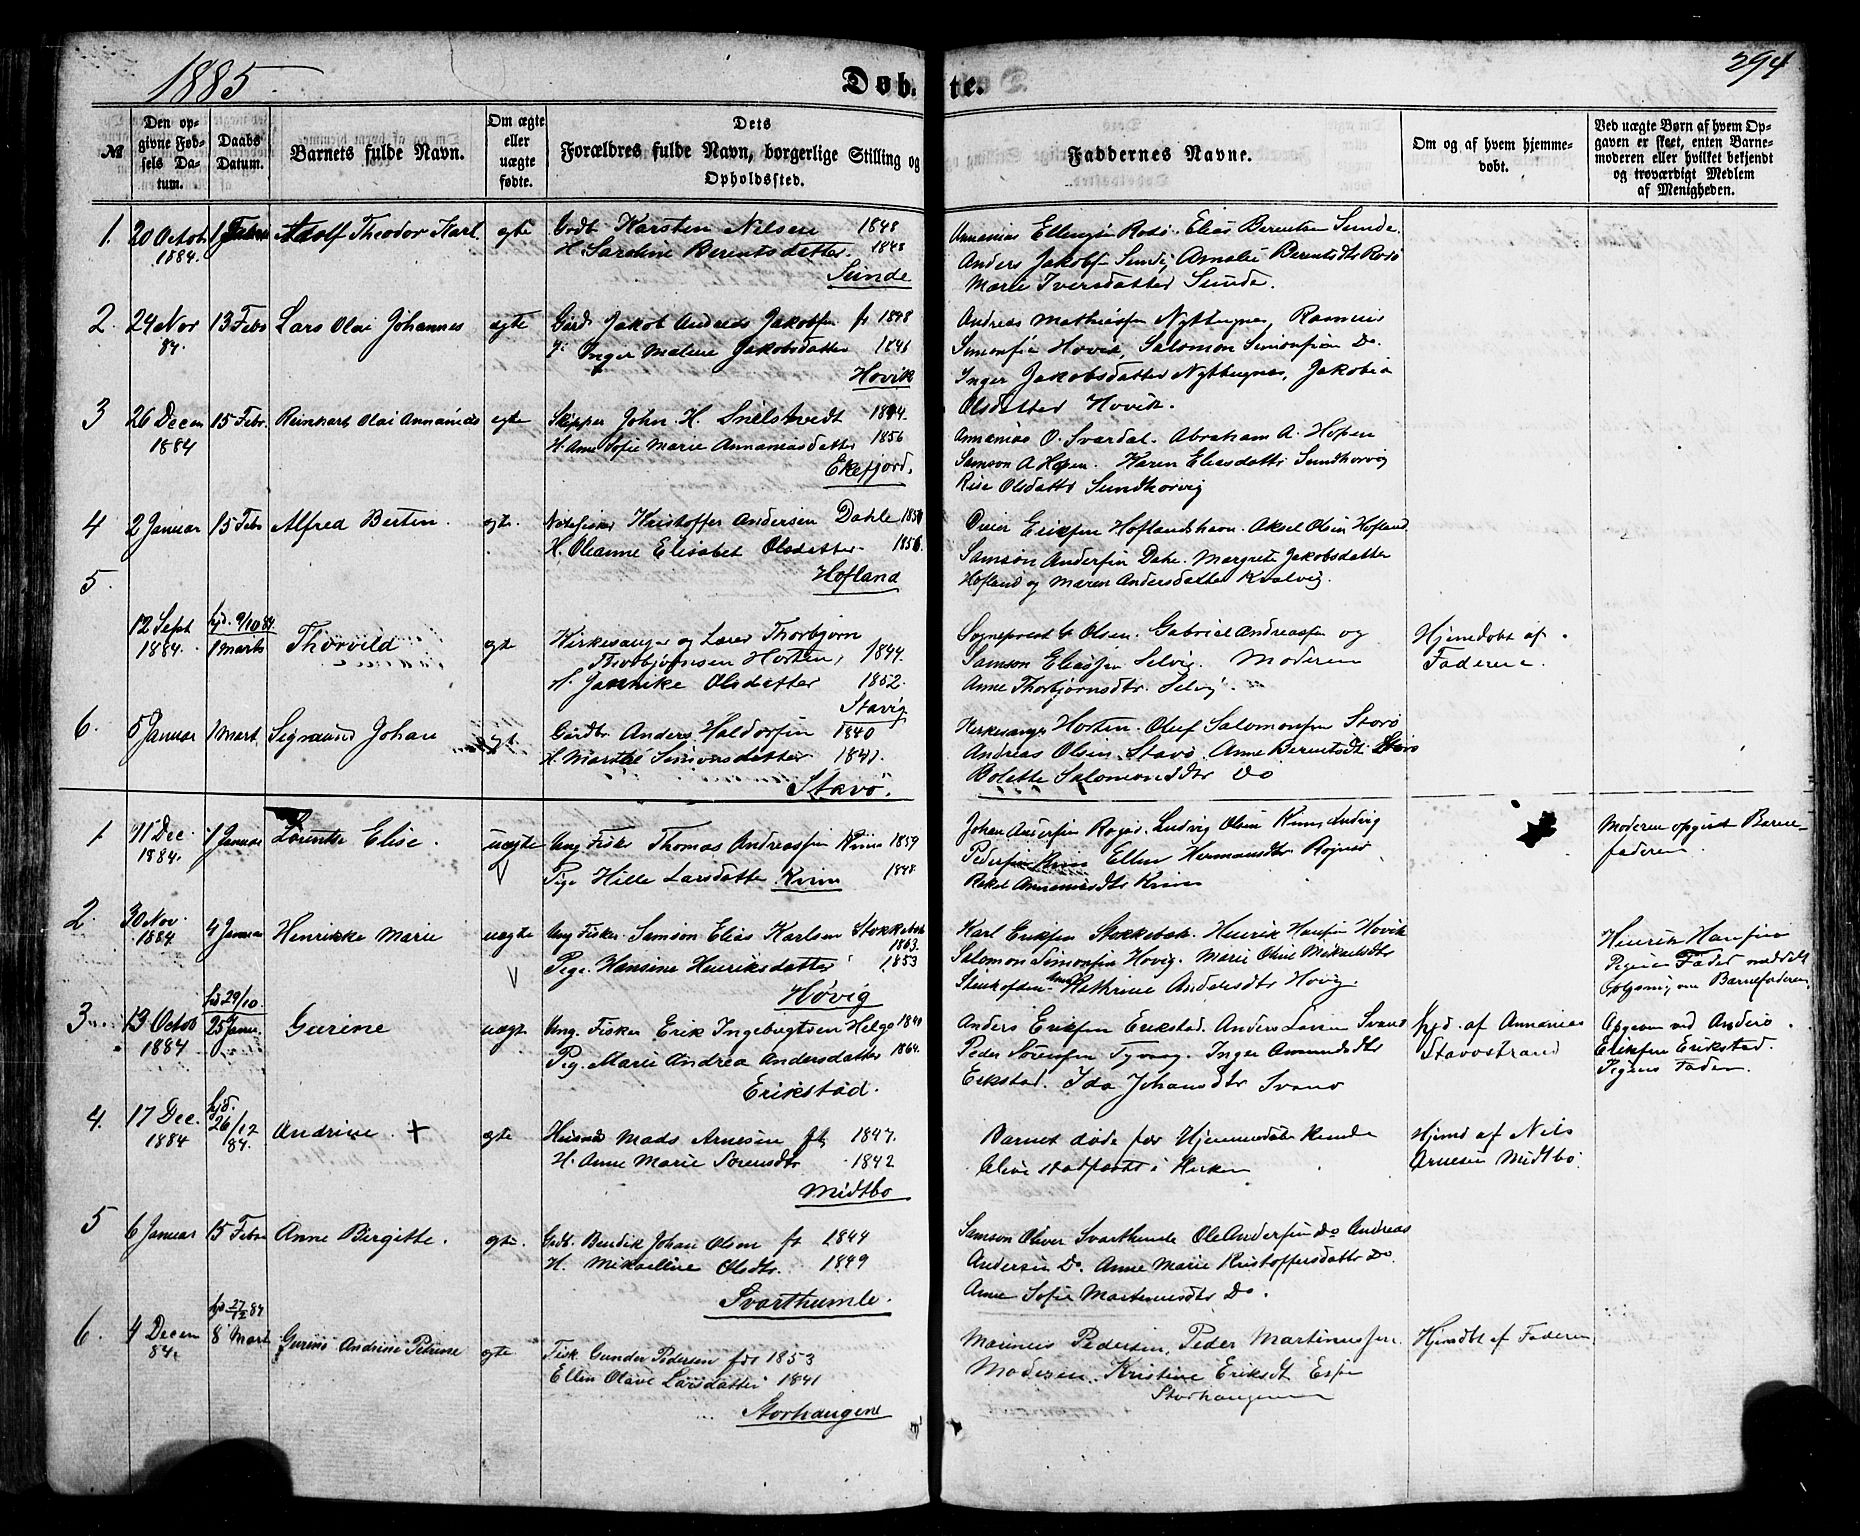 SAB, Kinn sokneprestembete, H/Haa/Haaa/L0006: Parish register (official) no. A 6, 1857-1885, p. 294